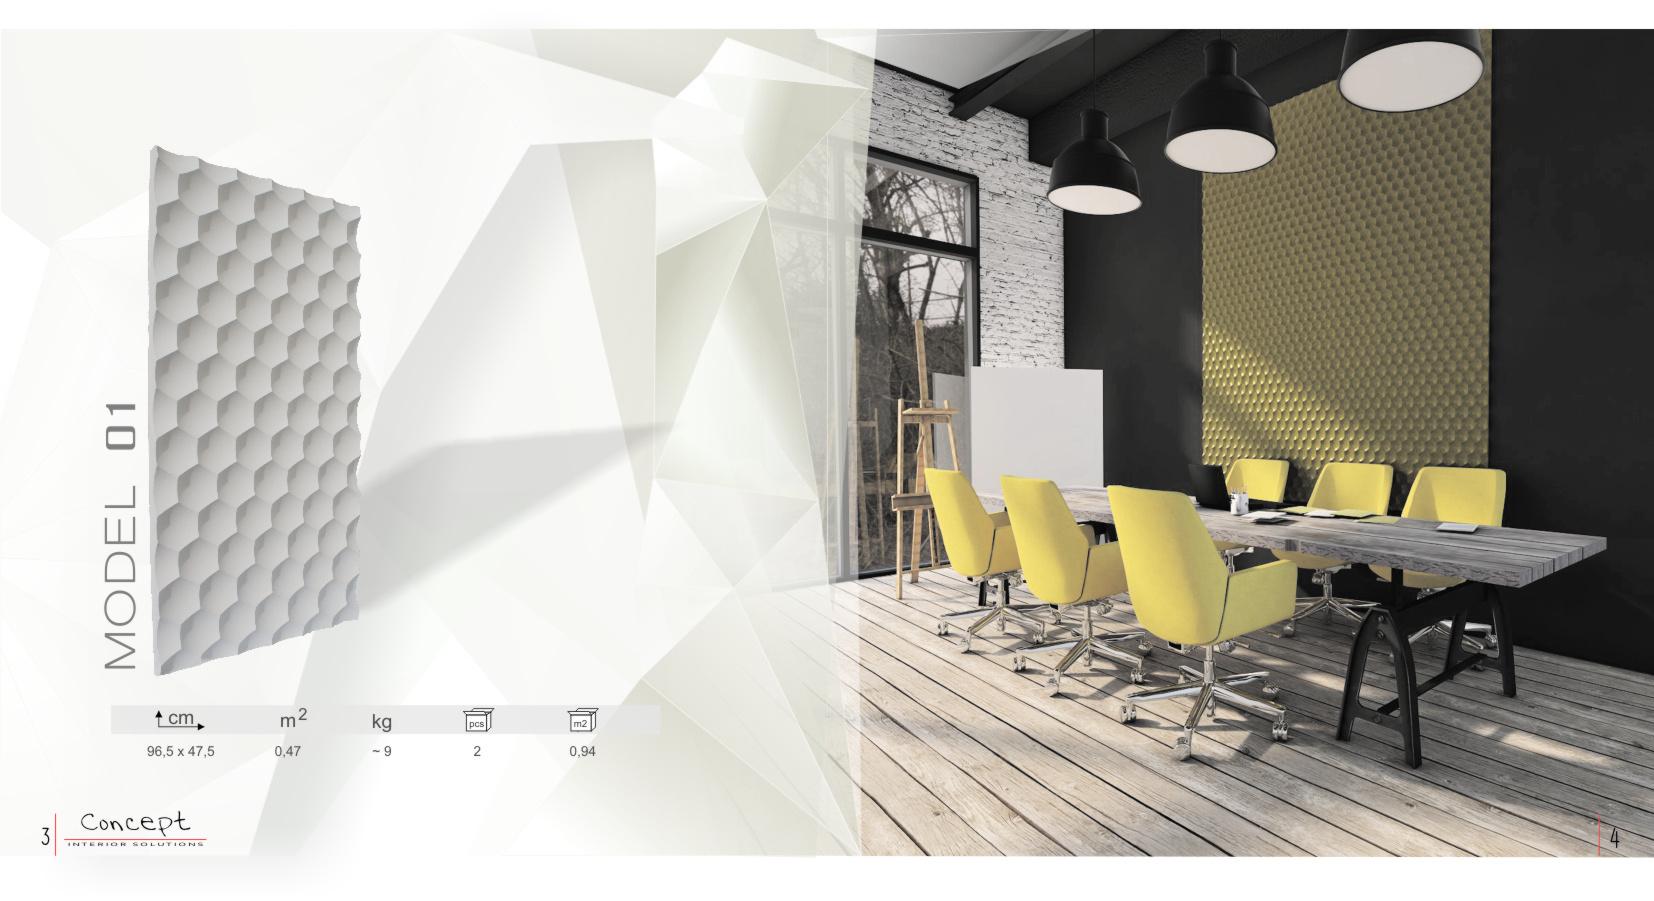 katalog panele gipsowe  Concept str3